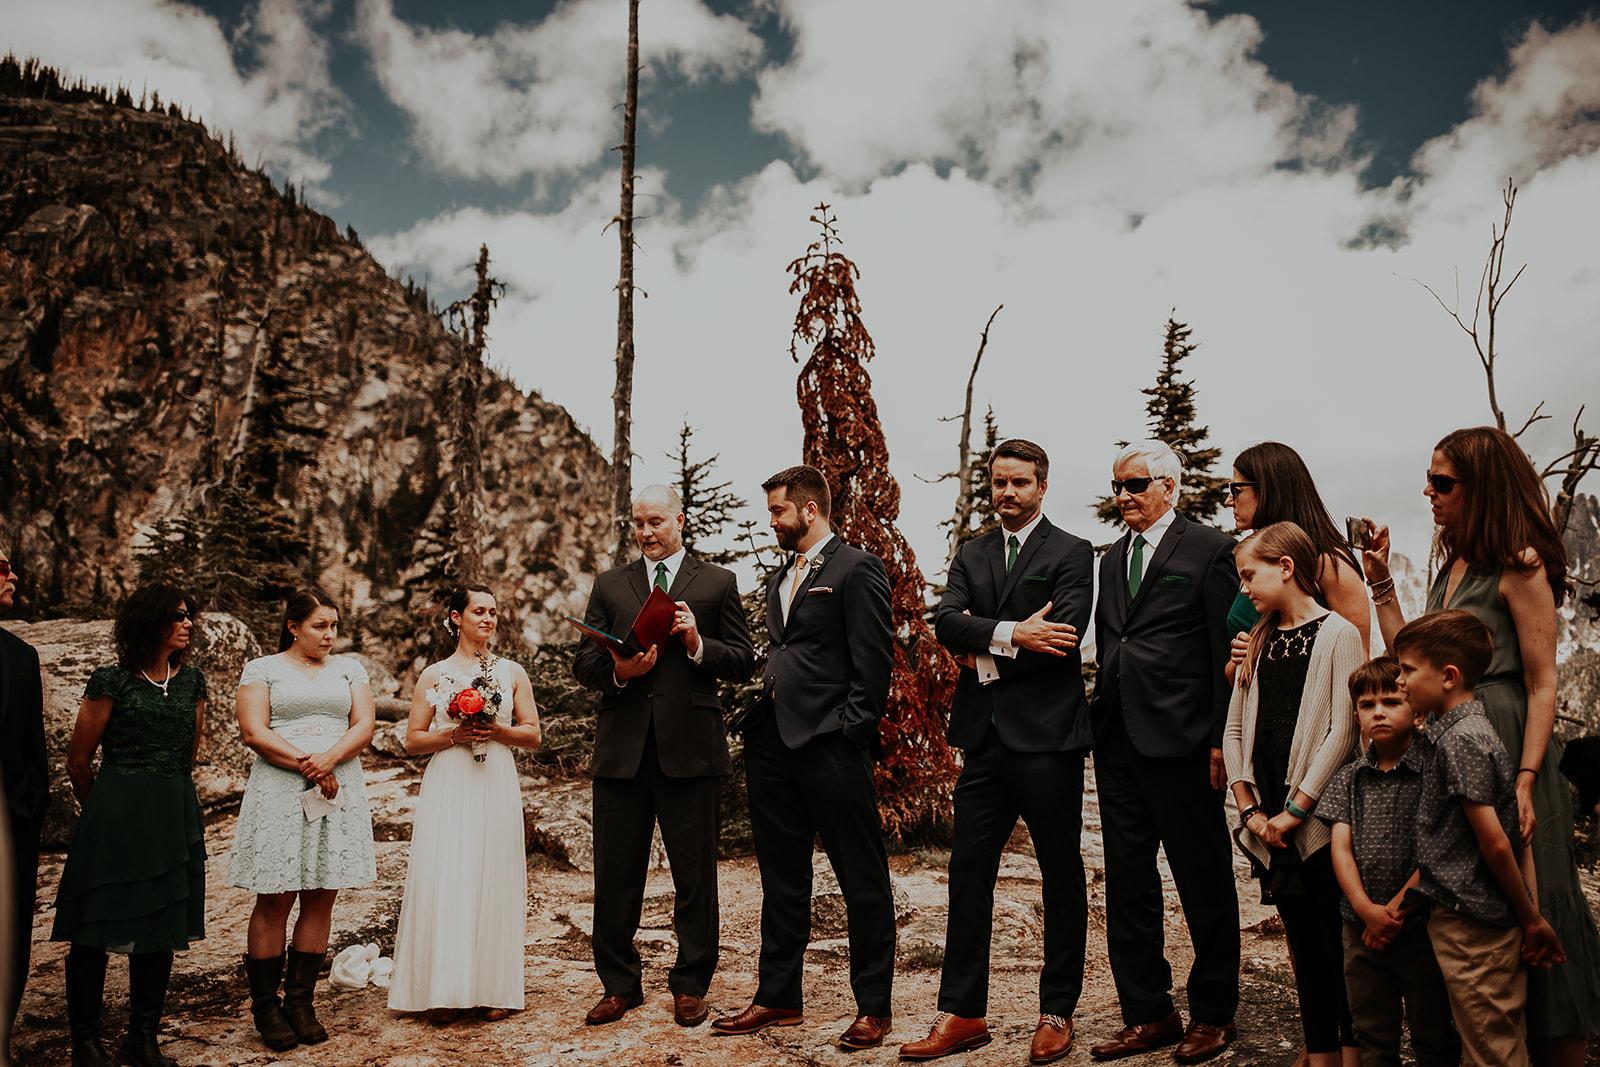 winthrop-wedding-photographer-megan-gallagher-photography (13).jpg